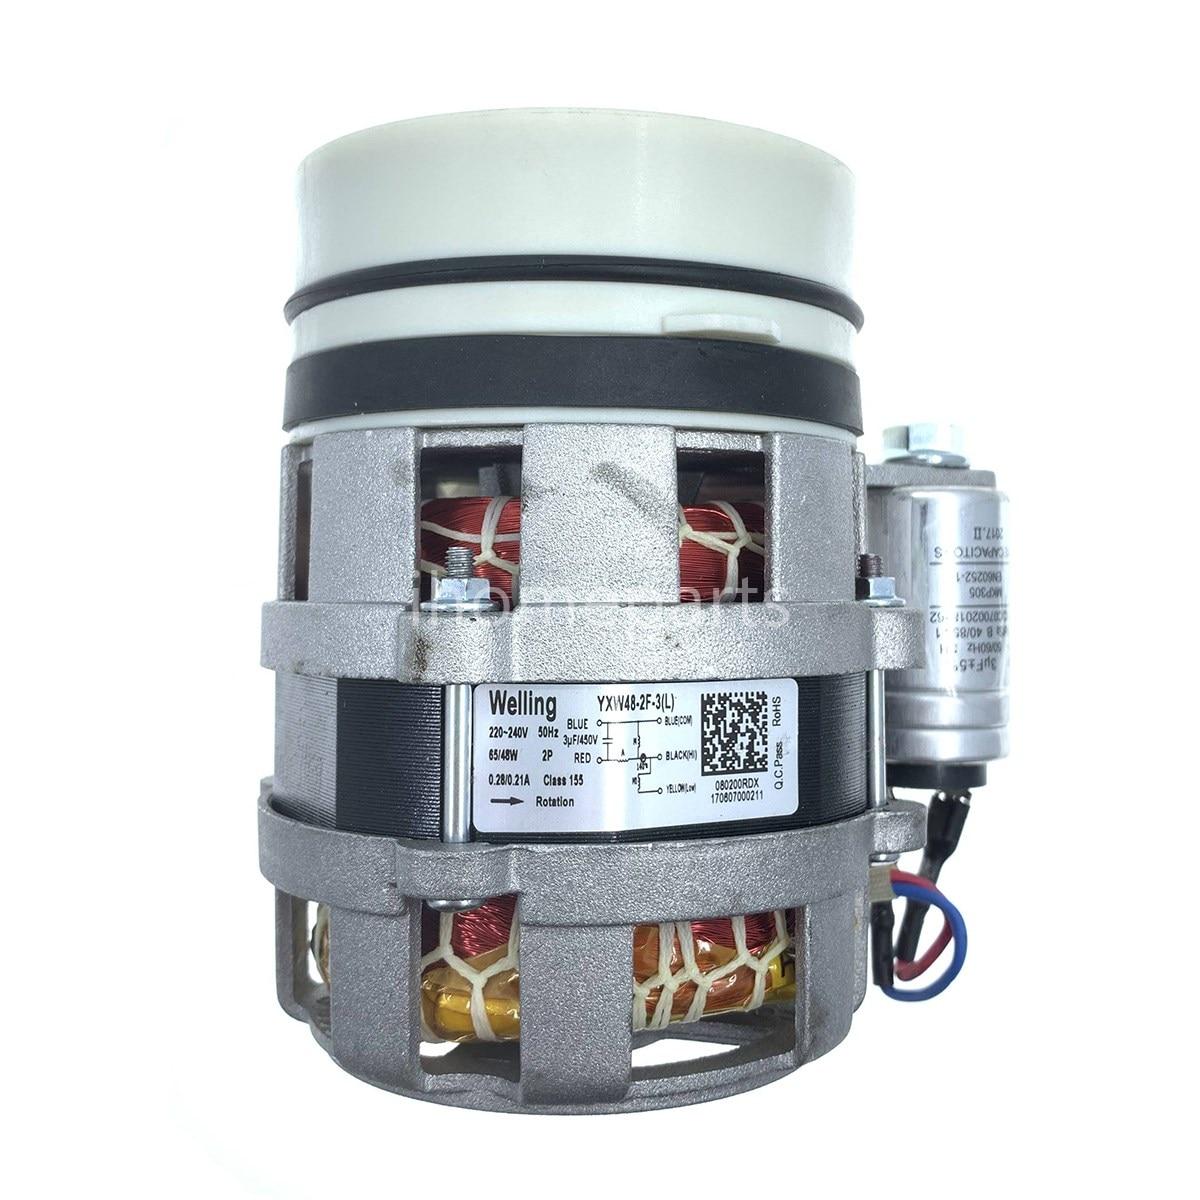 Welling YXW48-2F-3(L) 220V 65/48W Dishwasher Circulating Pump Motor for Hansa/Korting/Gorenje